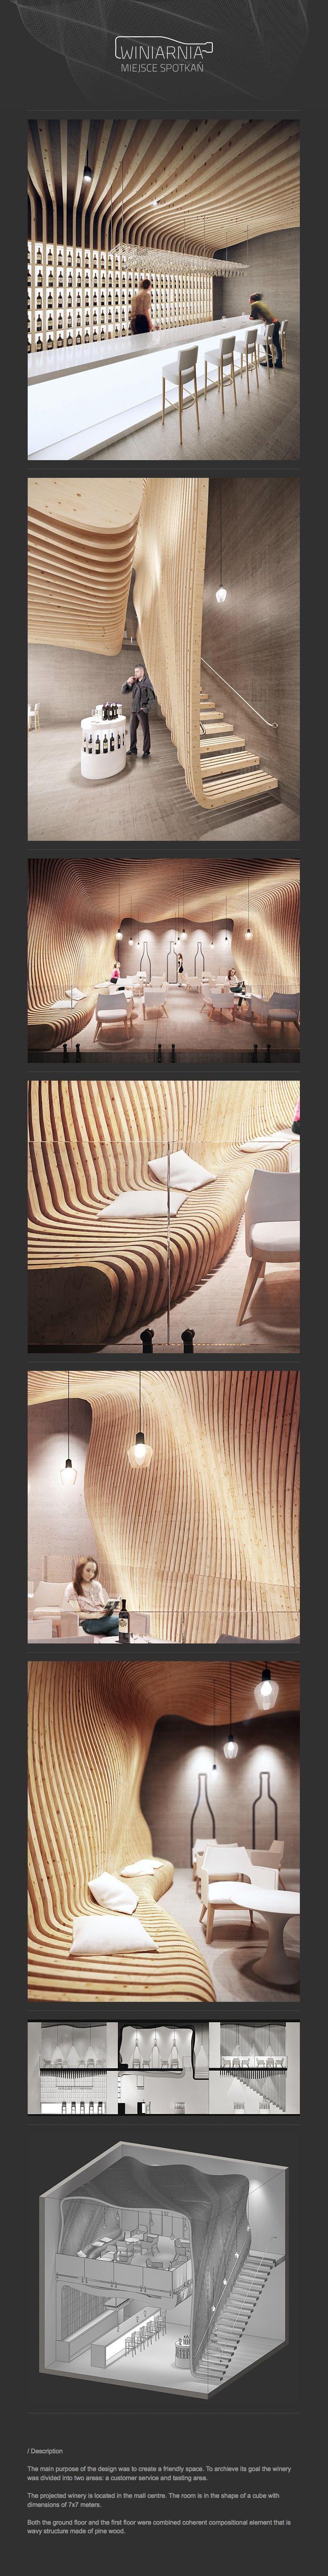 Winery design by Radek Ignaciuk